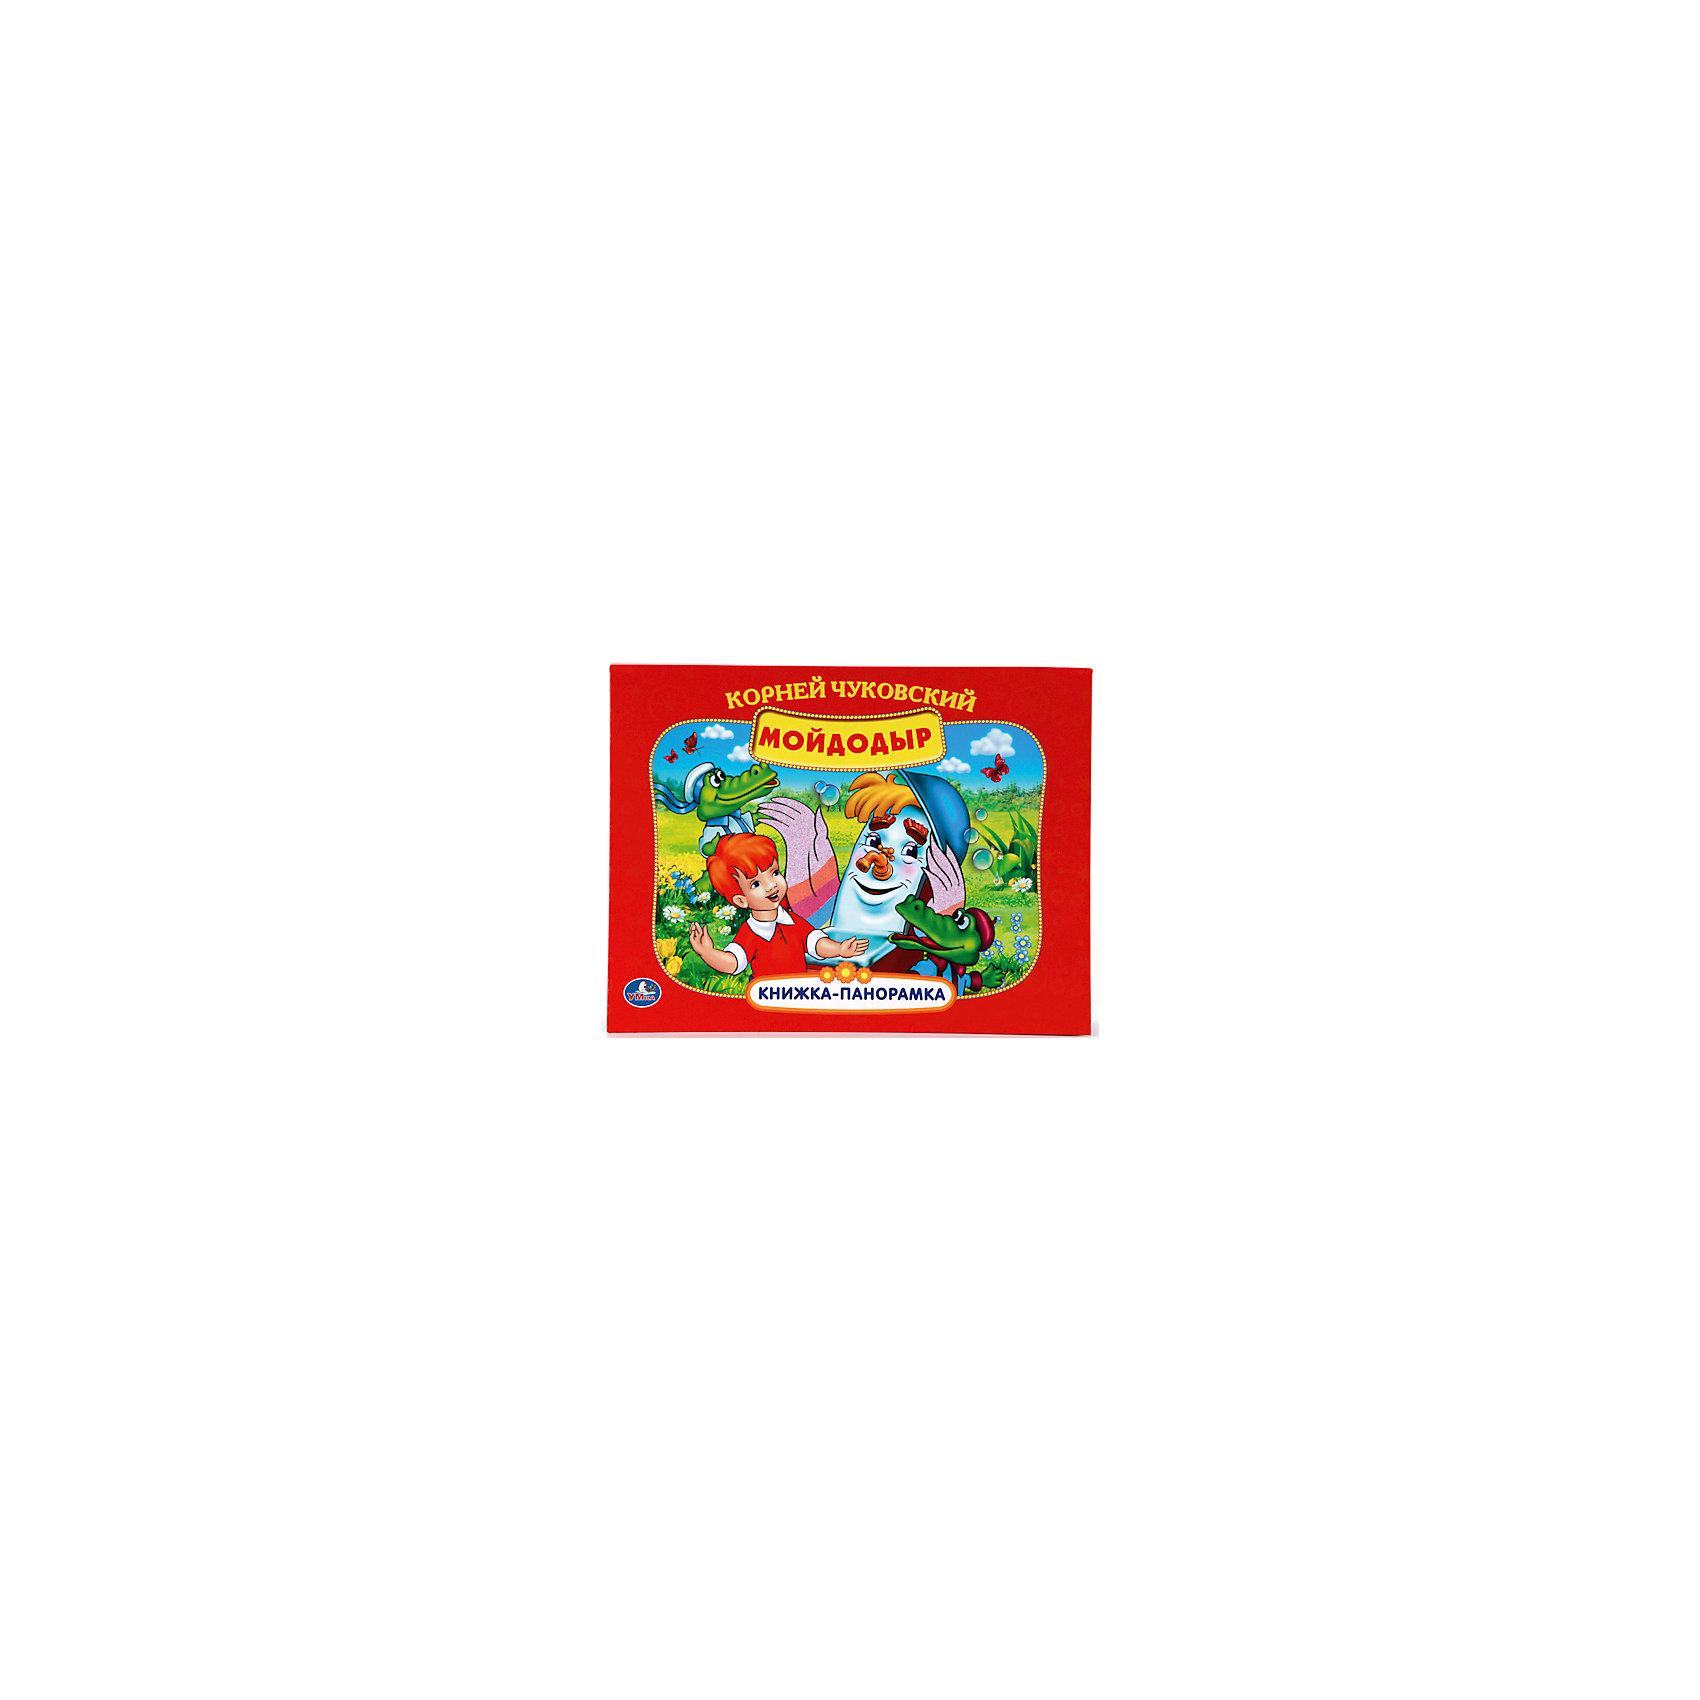 Умка Книжка-панорамка Мойдодыр, К. Чуковский, Умка говорящий плакат умка азбука в стихах к чуковский